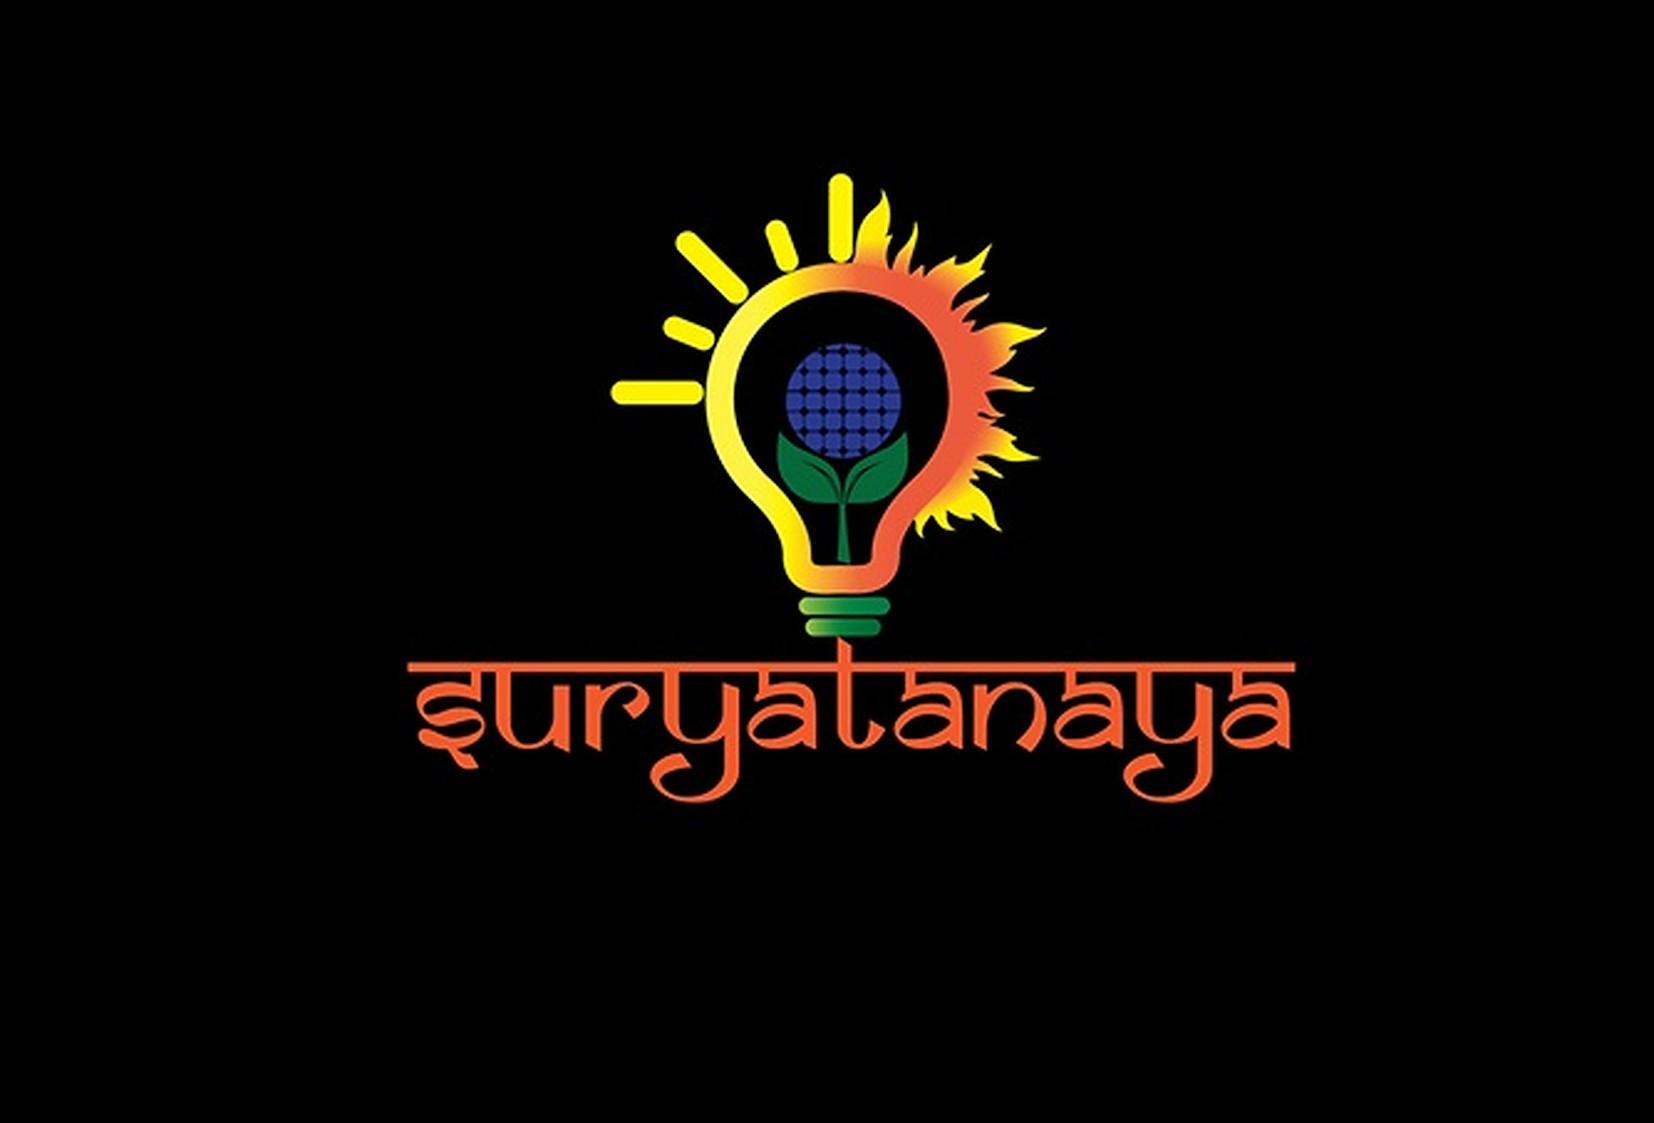 SURYATANAYA ENERGY SOLUTIONS, SOLAR,  service in Palarivattom, Ernakulam